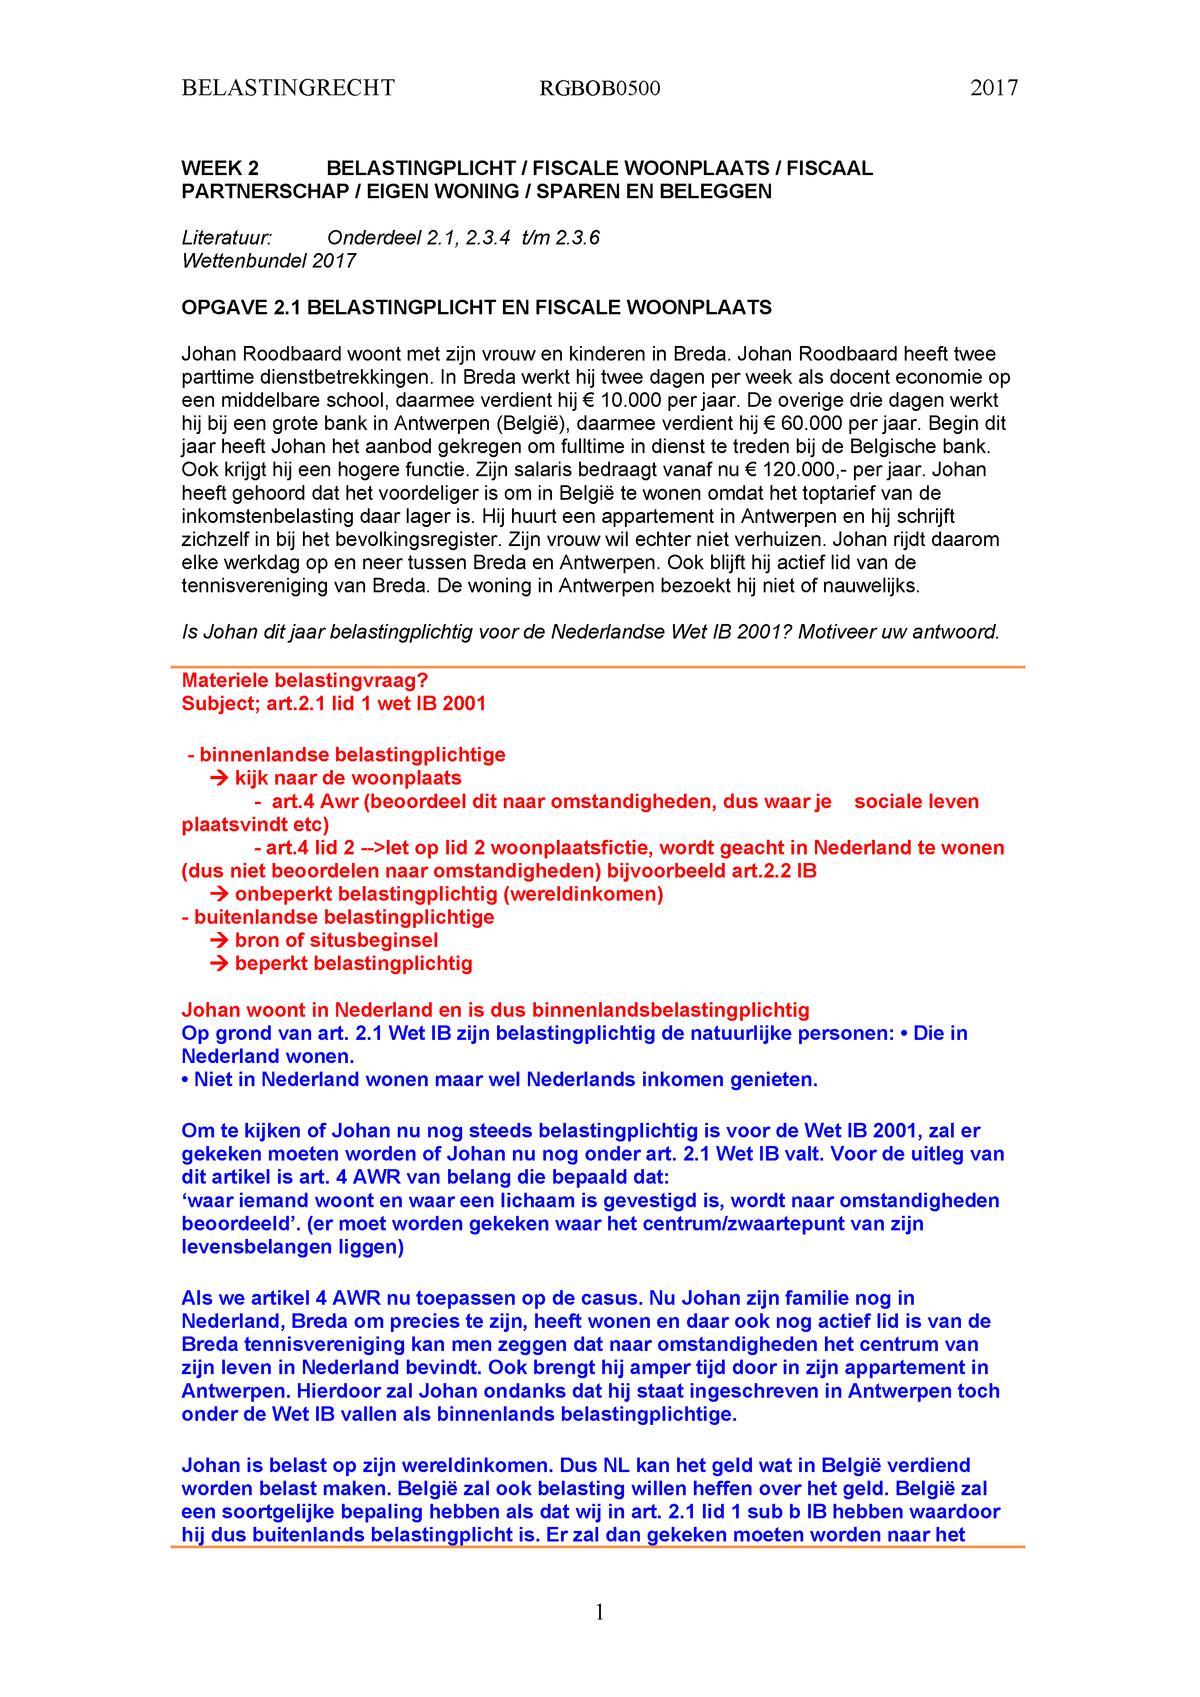 Belastingrecht week 2 (Belastingplicht partner Eigen Woning